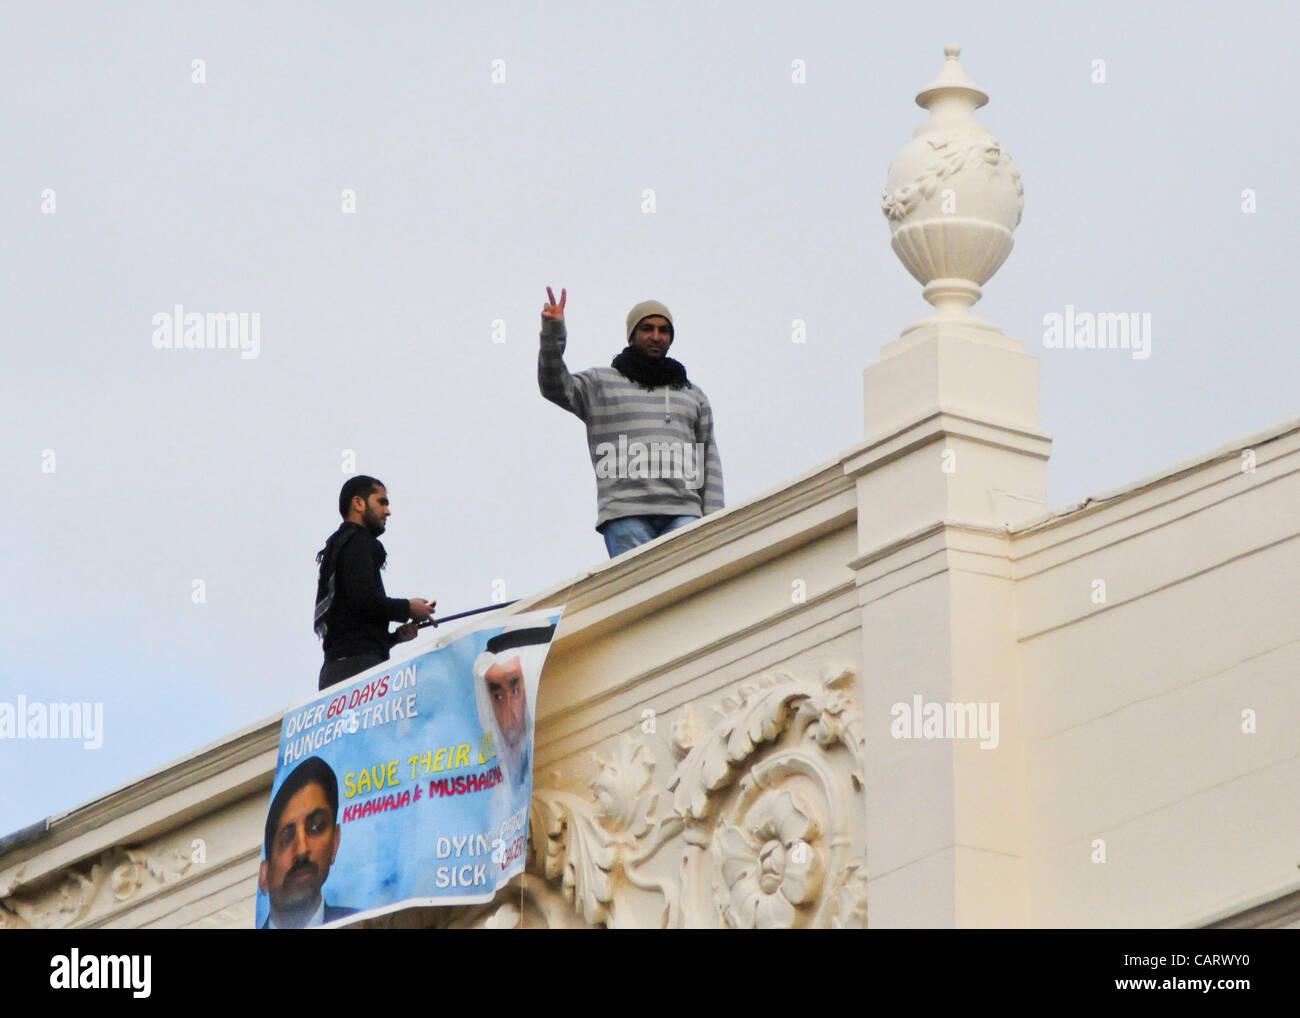 London UK 16 04 12 Bahraini Hunger Strikers Ali Mushaima Left And Mosa Abd Protesting On The Roof Of Embassy Kingdom Bahrain In